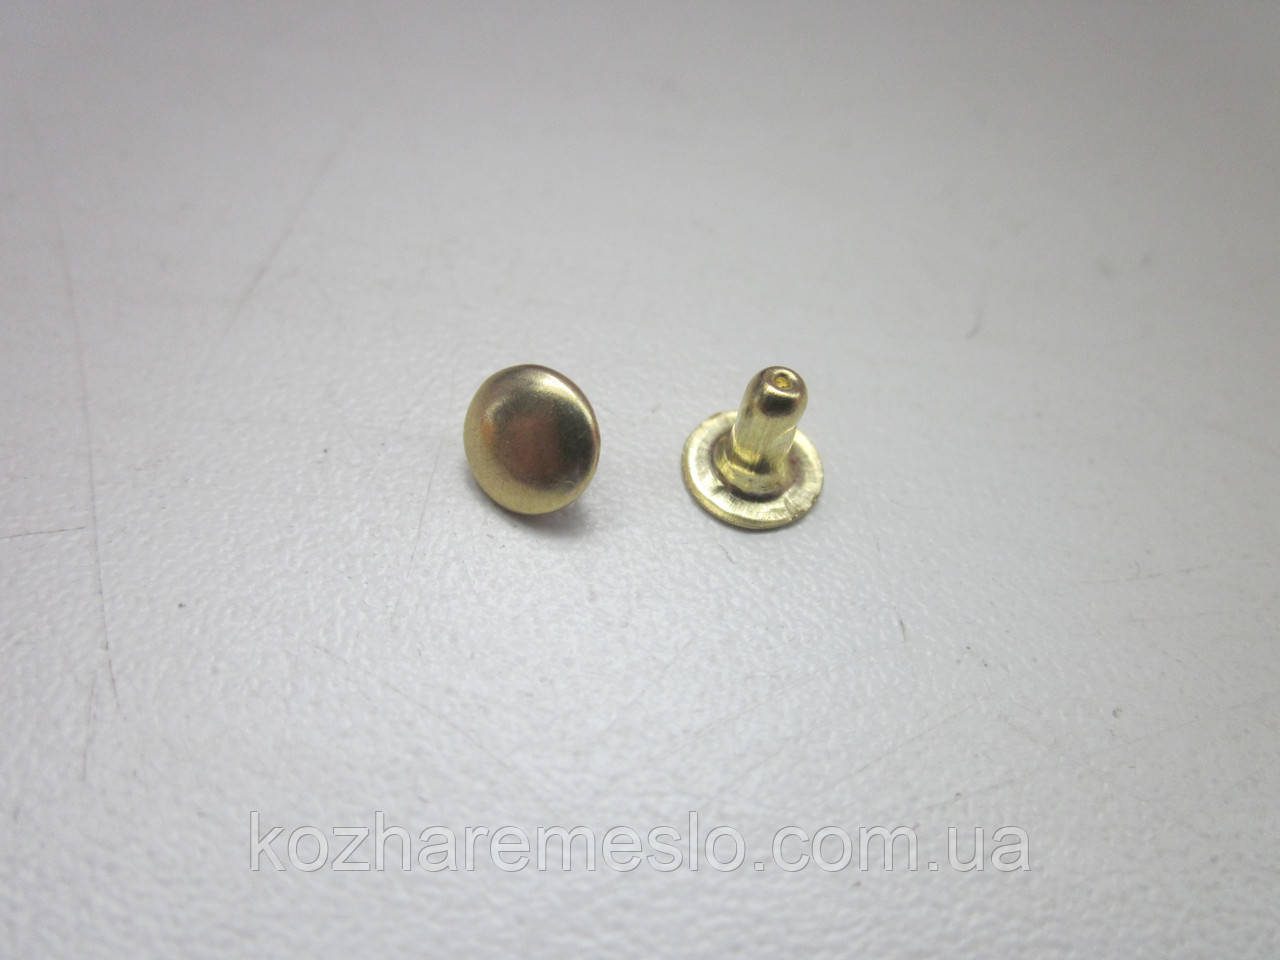 Хольнитен (заклёпка) односторонний 9 х 9 х 12 мм золото